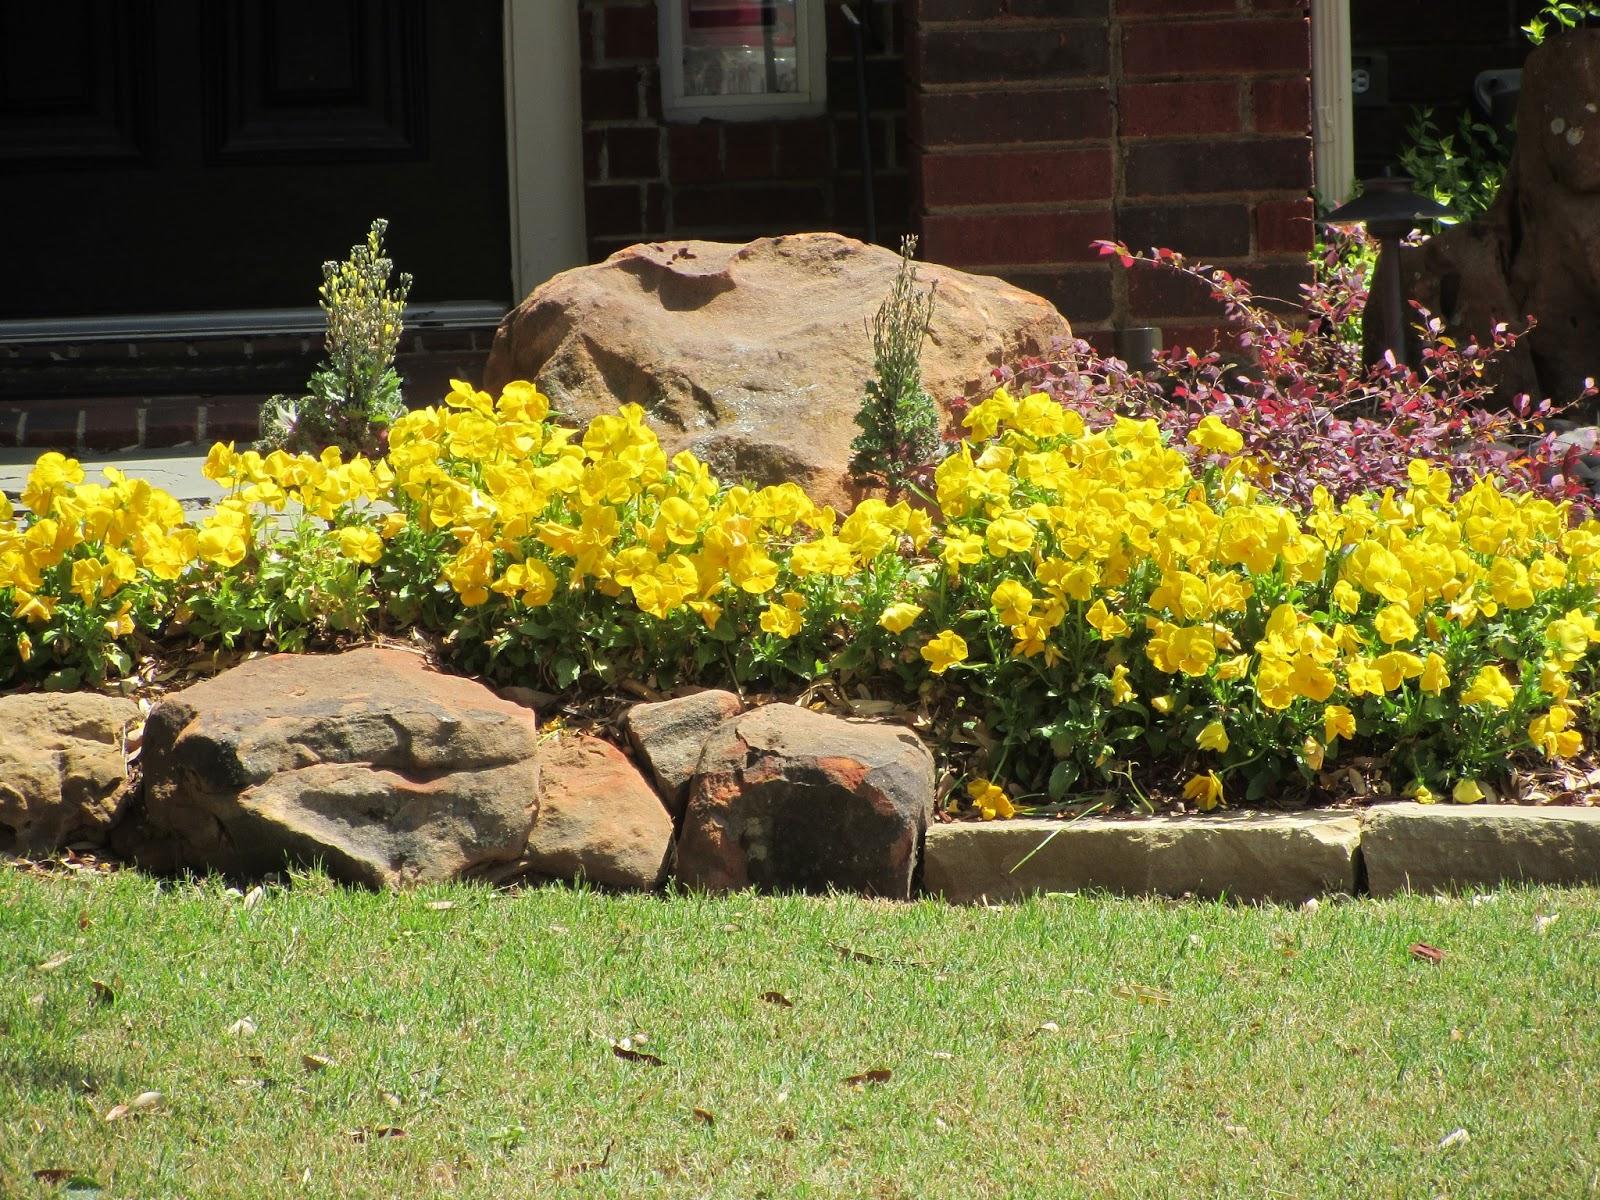 At rivercrest cottage rocks in your beds for Rock flower bed ideas